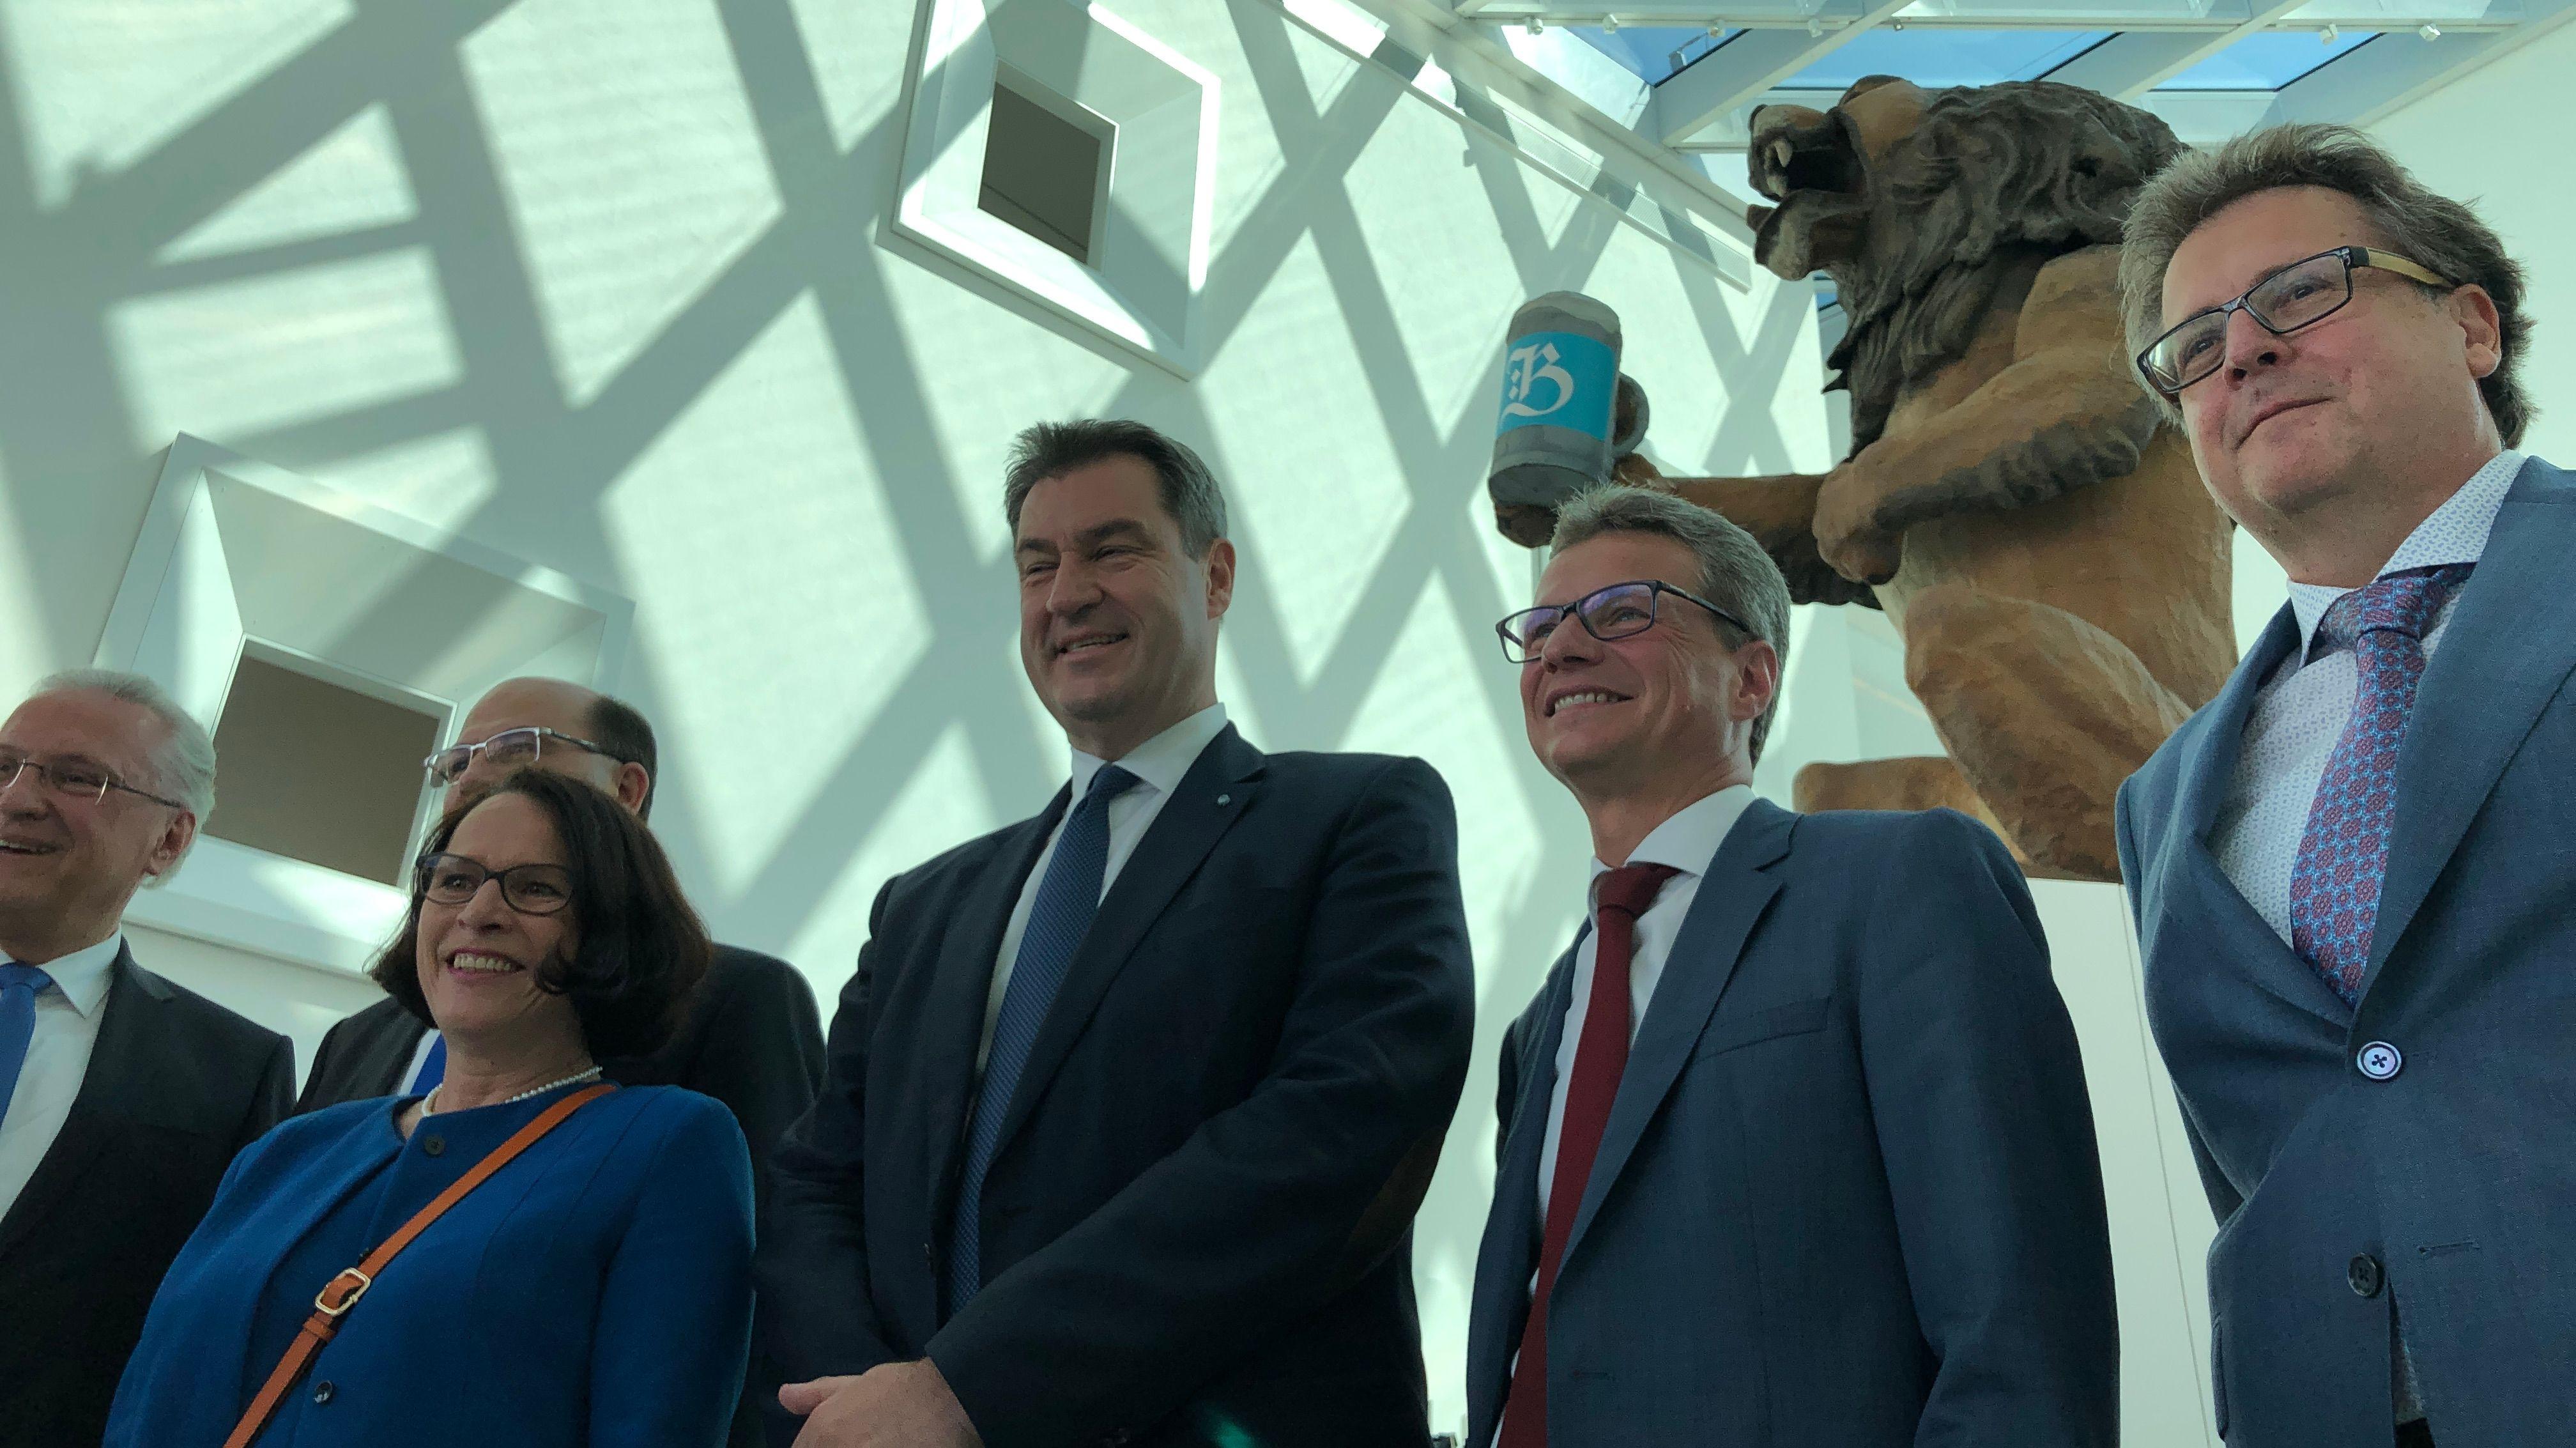 (v.l.n.r.) Bürgermeisterin Gertrud Maltz-Schwarzfischer, Ministerpräsident Söder, Kunstminister Sibler und Museumsdirektor Loibl